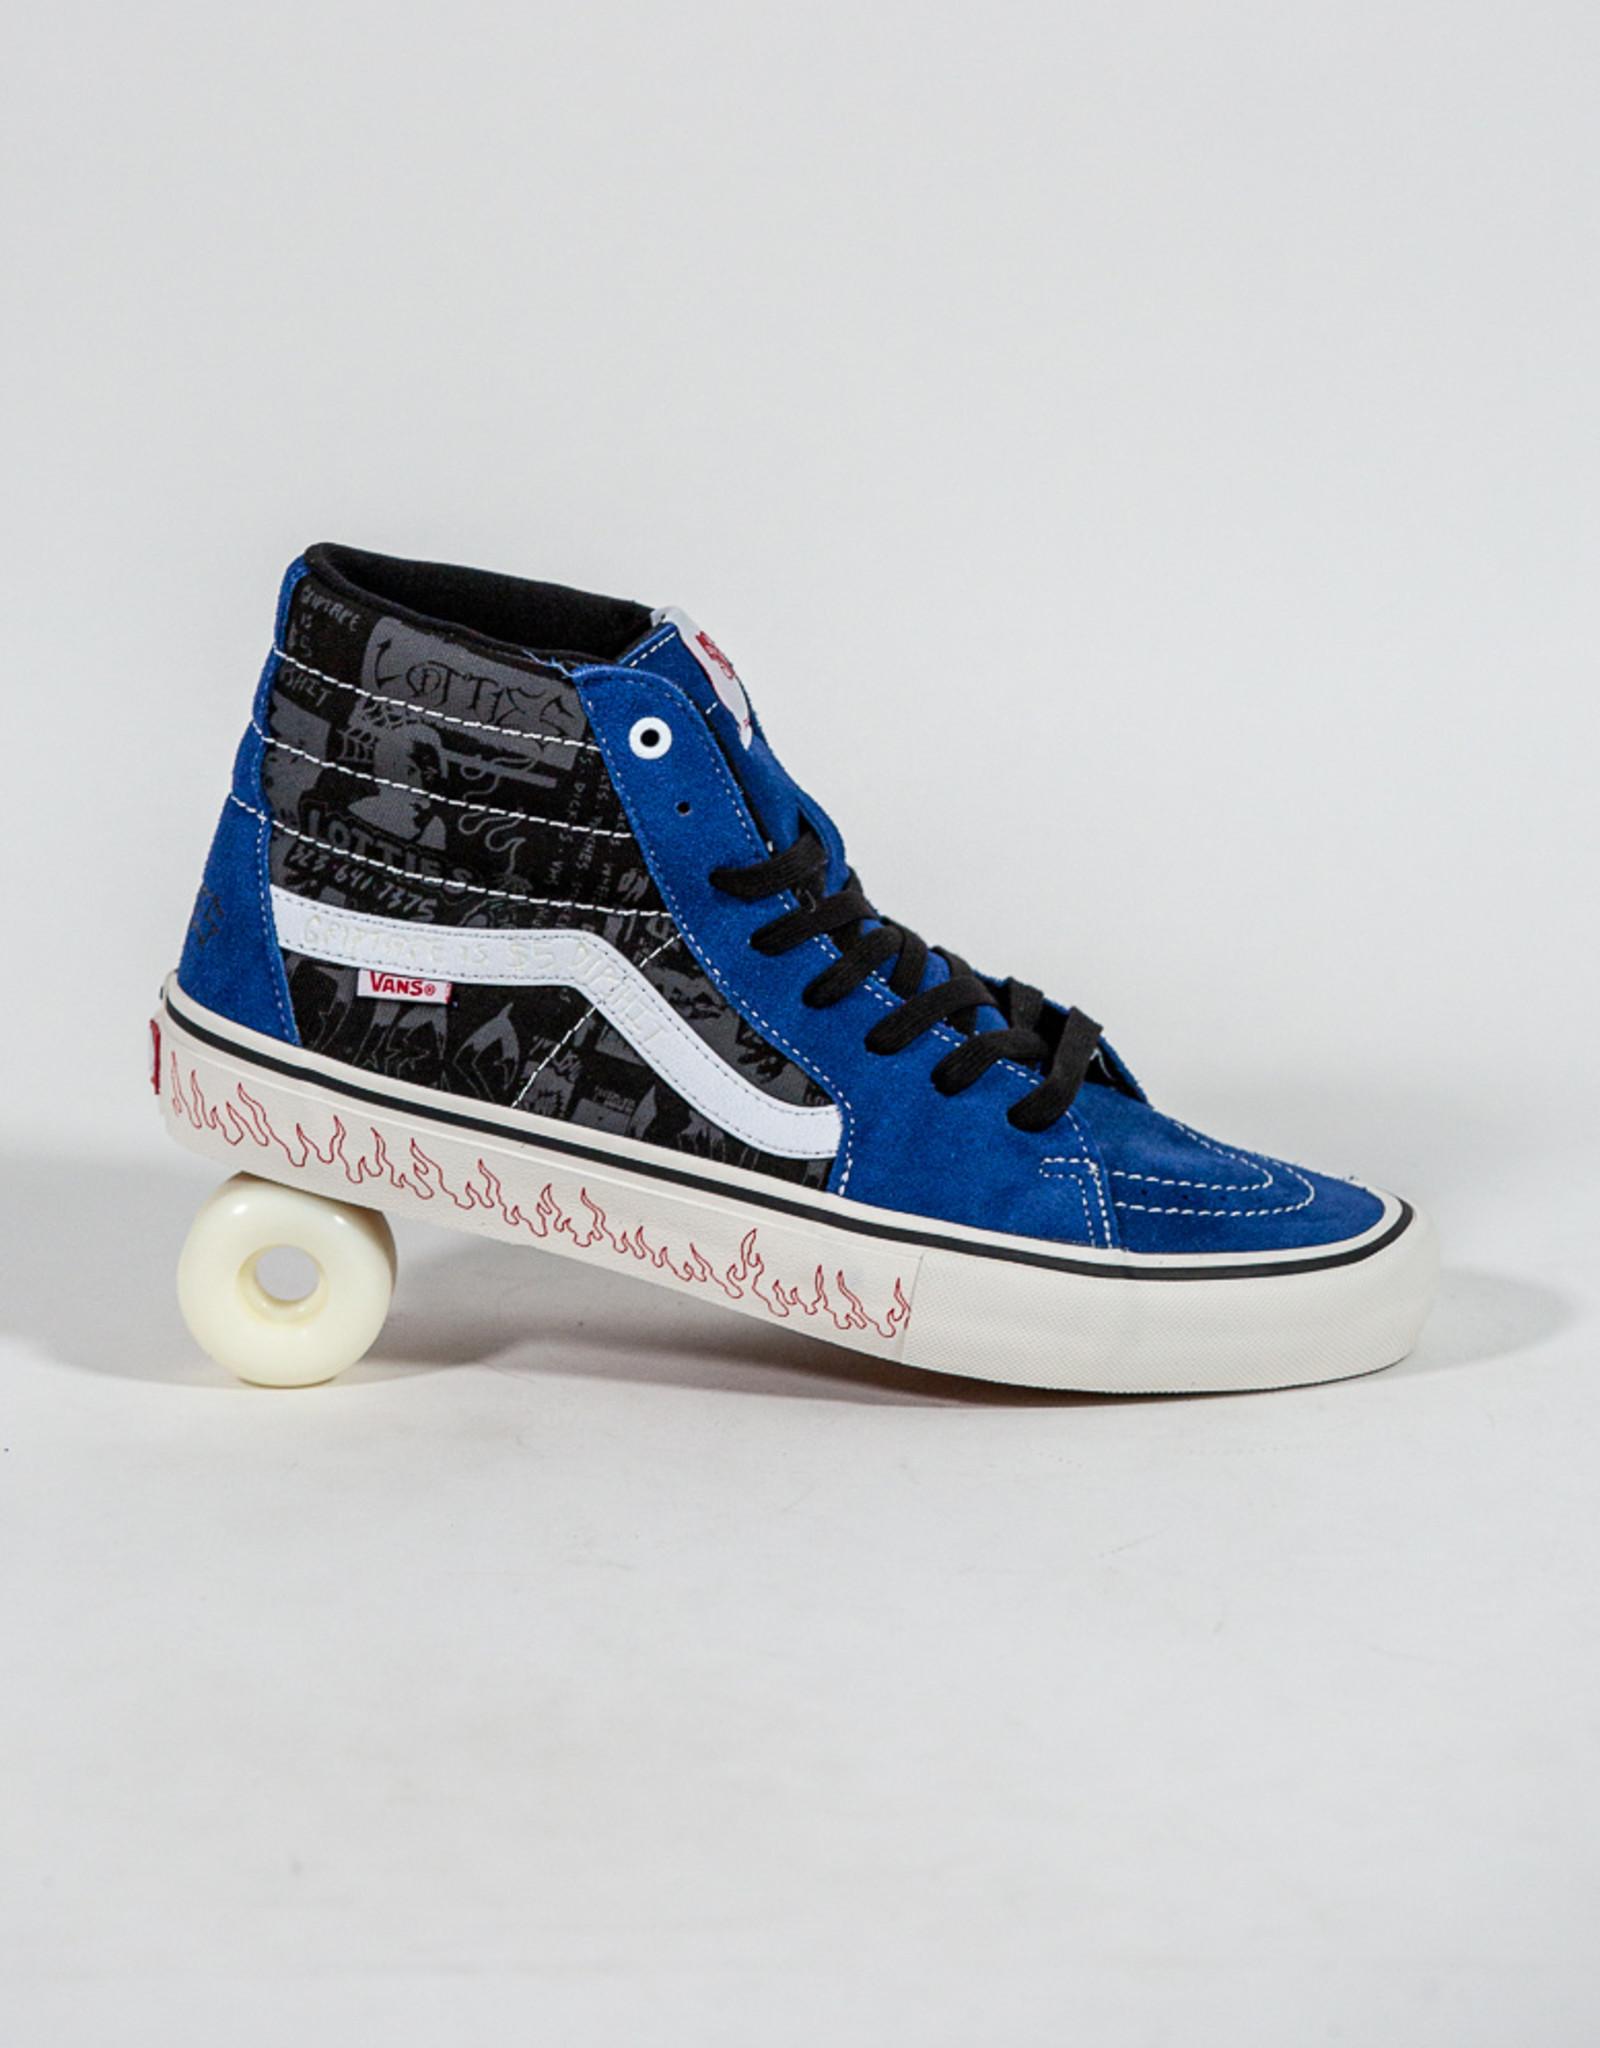 VANS VANS SK8-HI PRO LTD - (LOTTIES) BLUE/BLACK